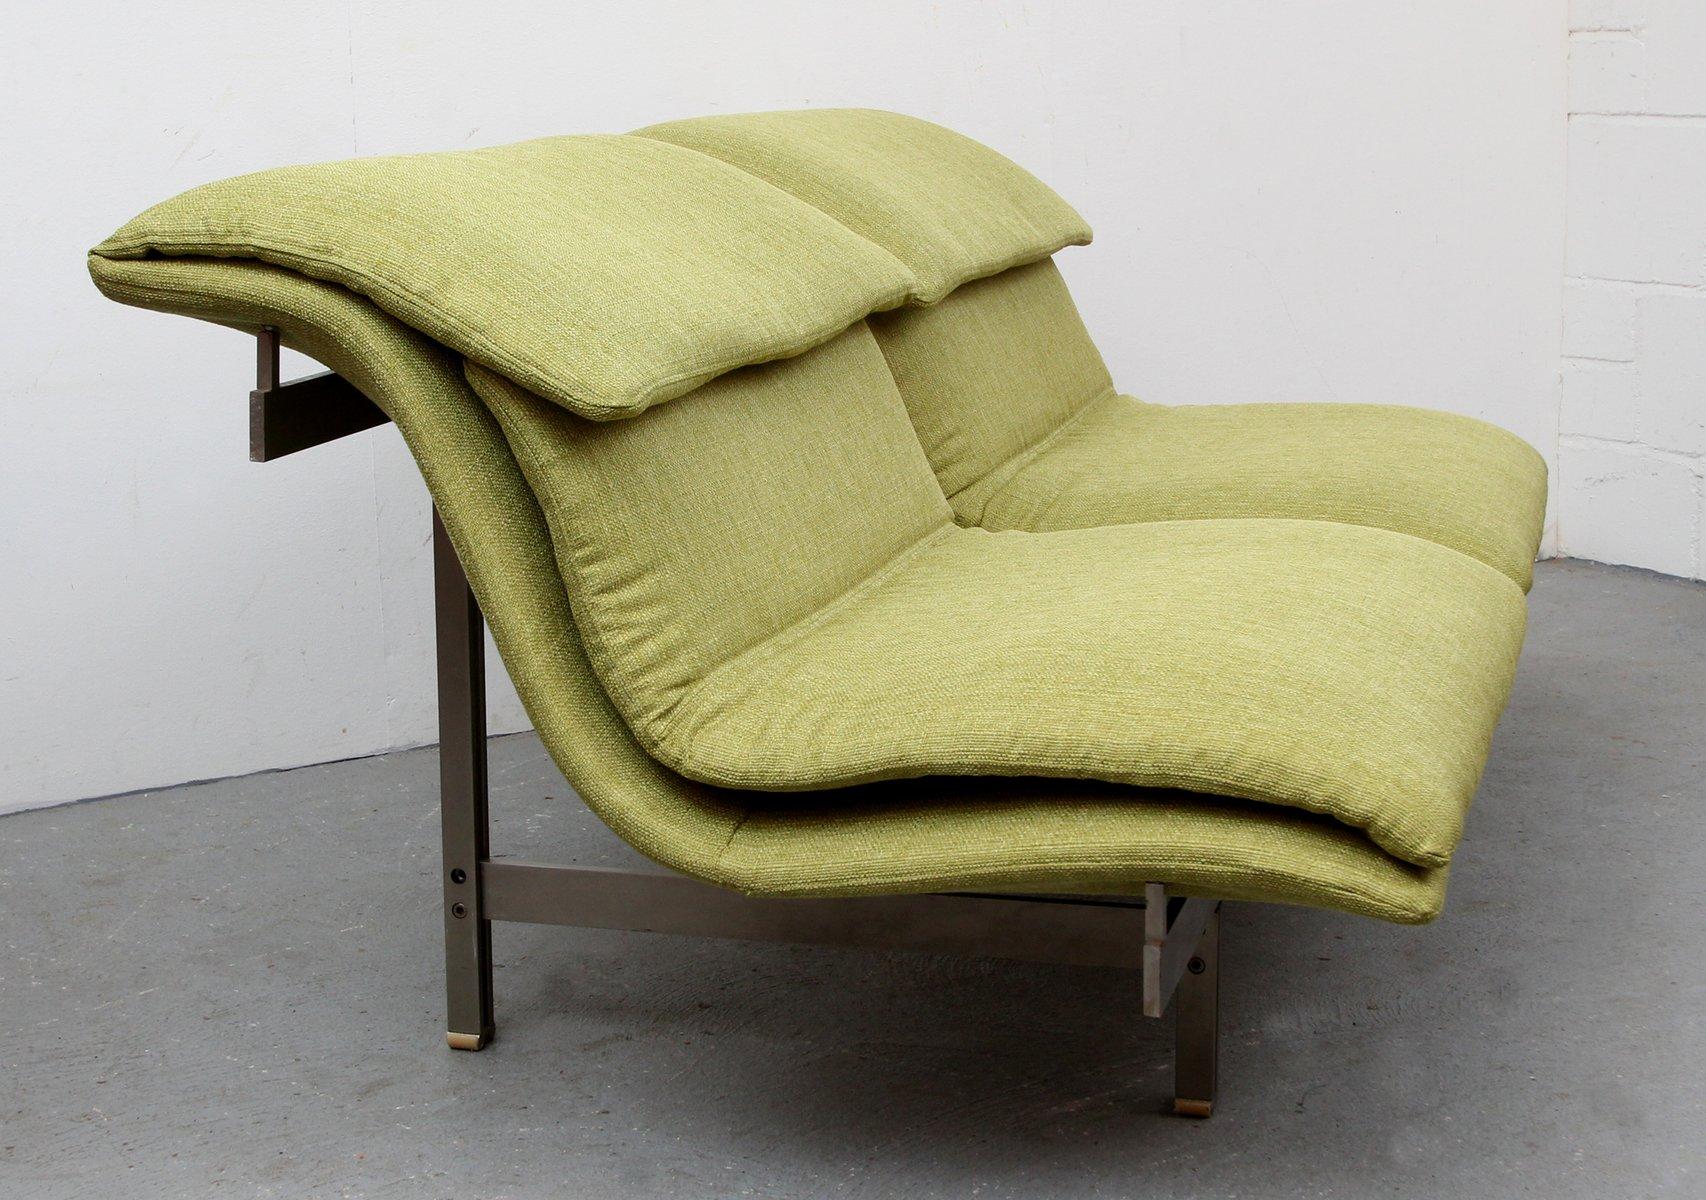 wave sofa von giovanni offredi f r saporiti 1970er bei pamono kaufen. Black Bedroom Furniture Sets. Home Design Ideas